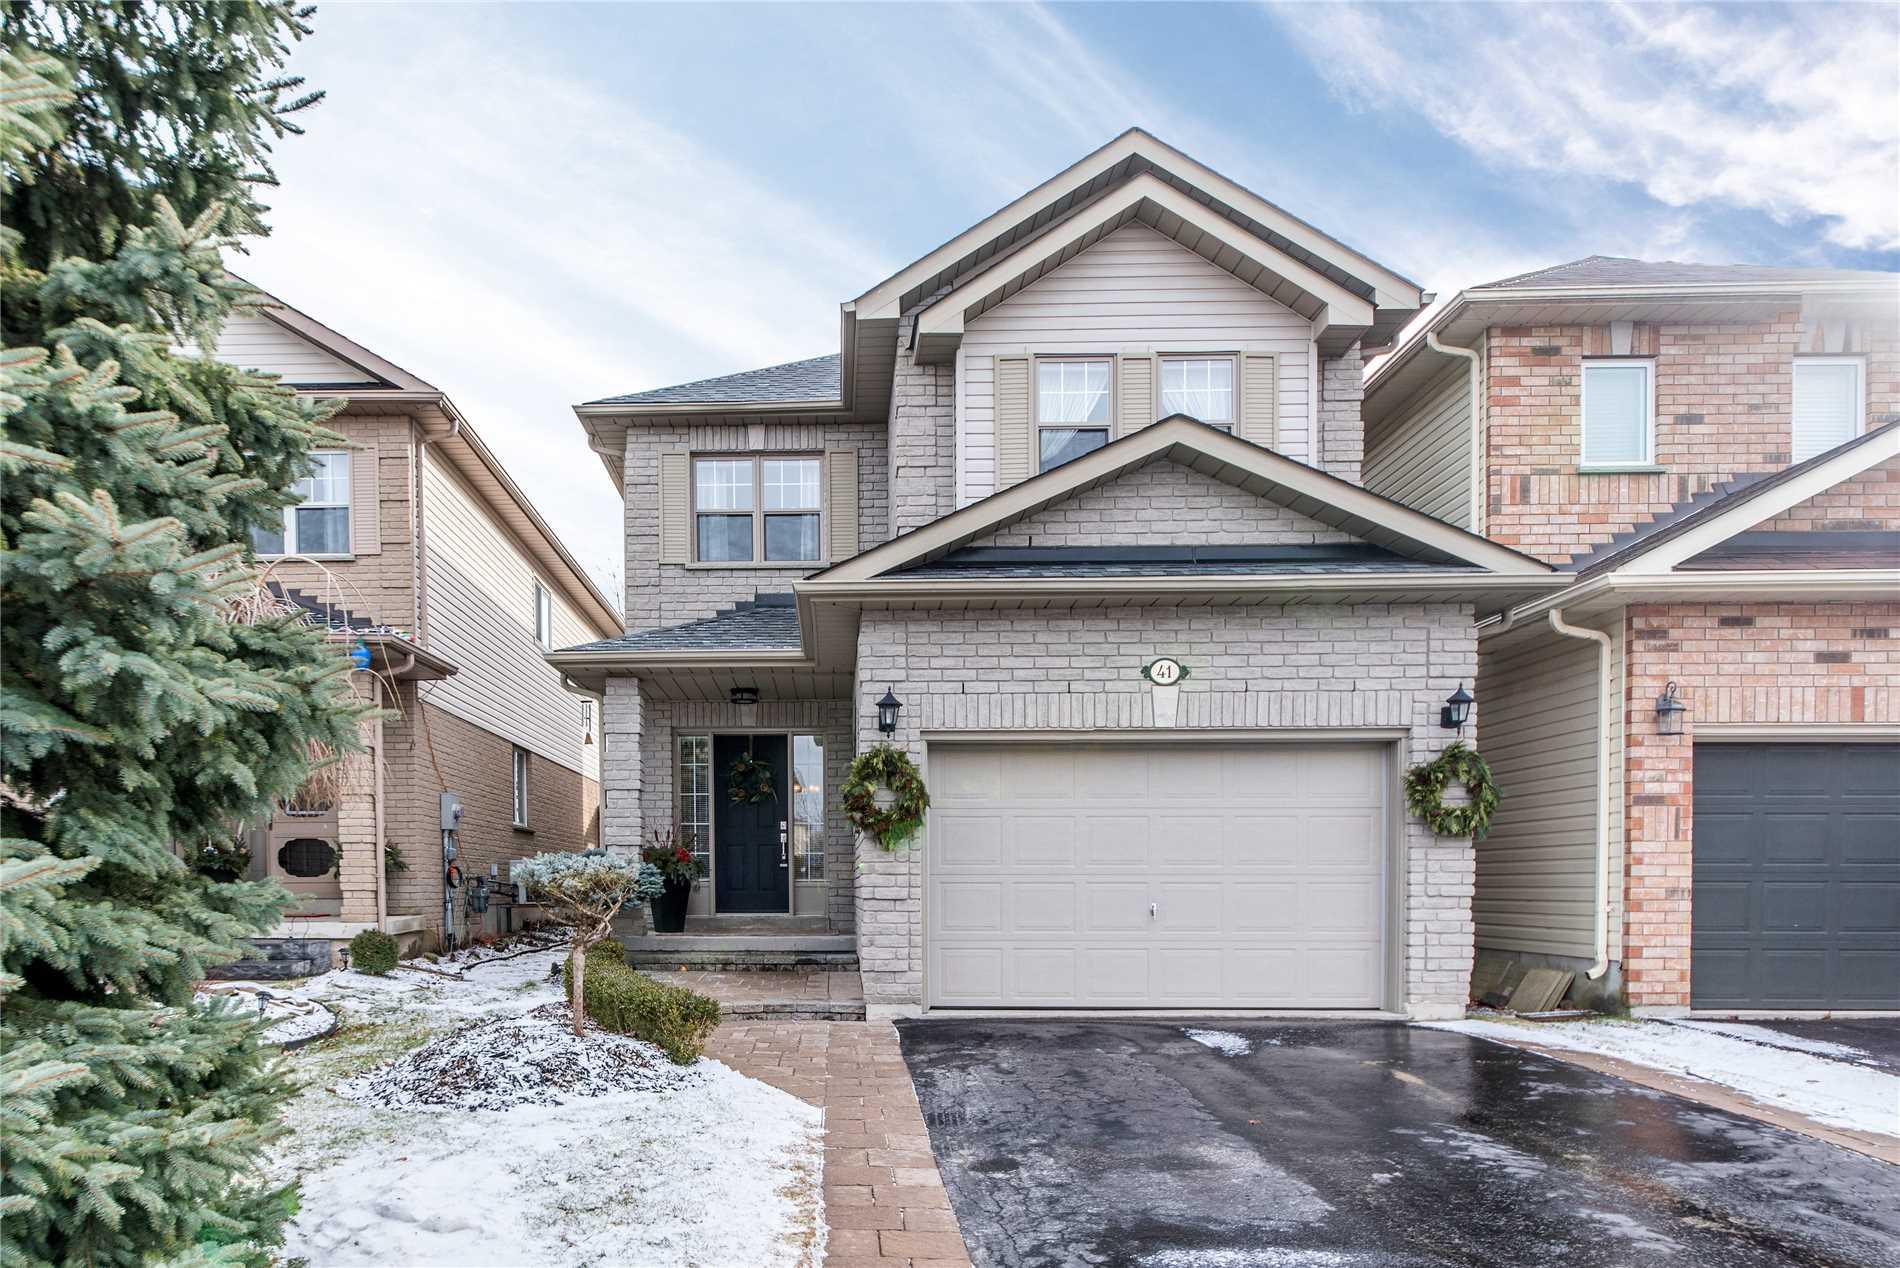 House for sale at 41 Caleche Avenue Clarington Ontario - MLS: E4333698